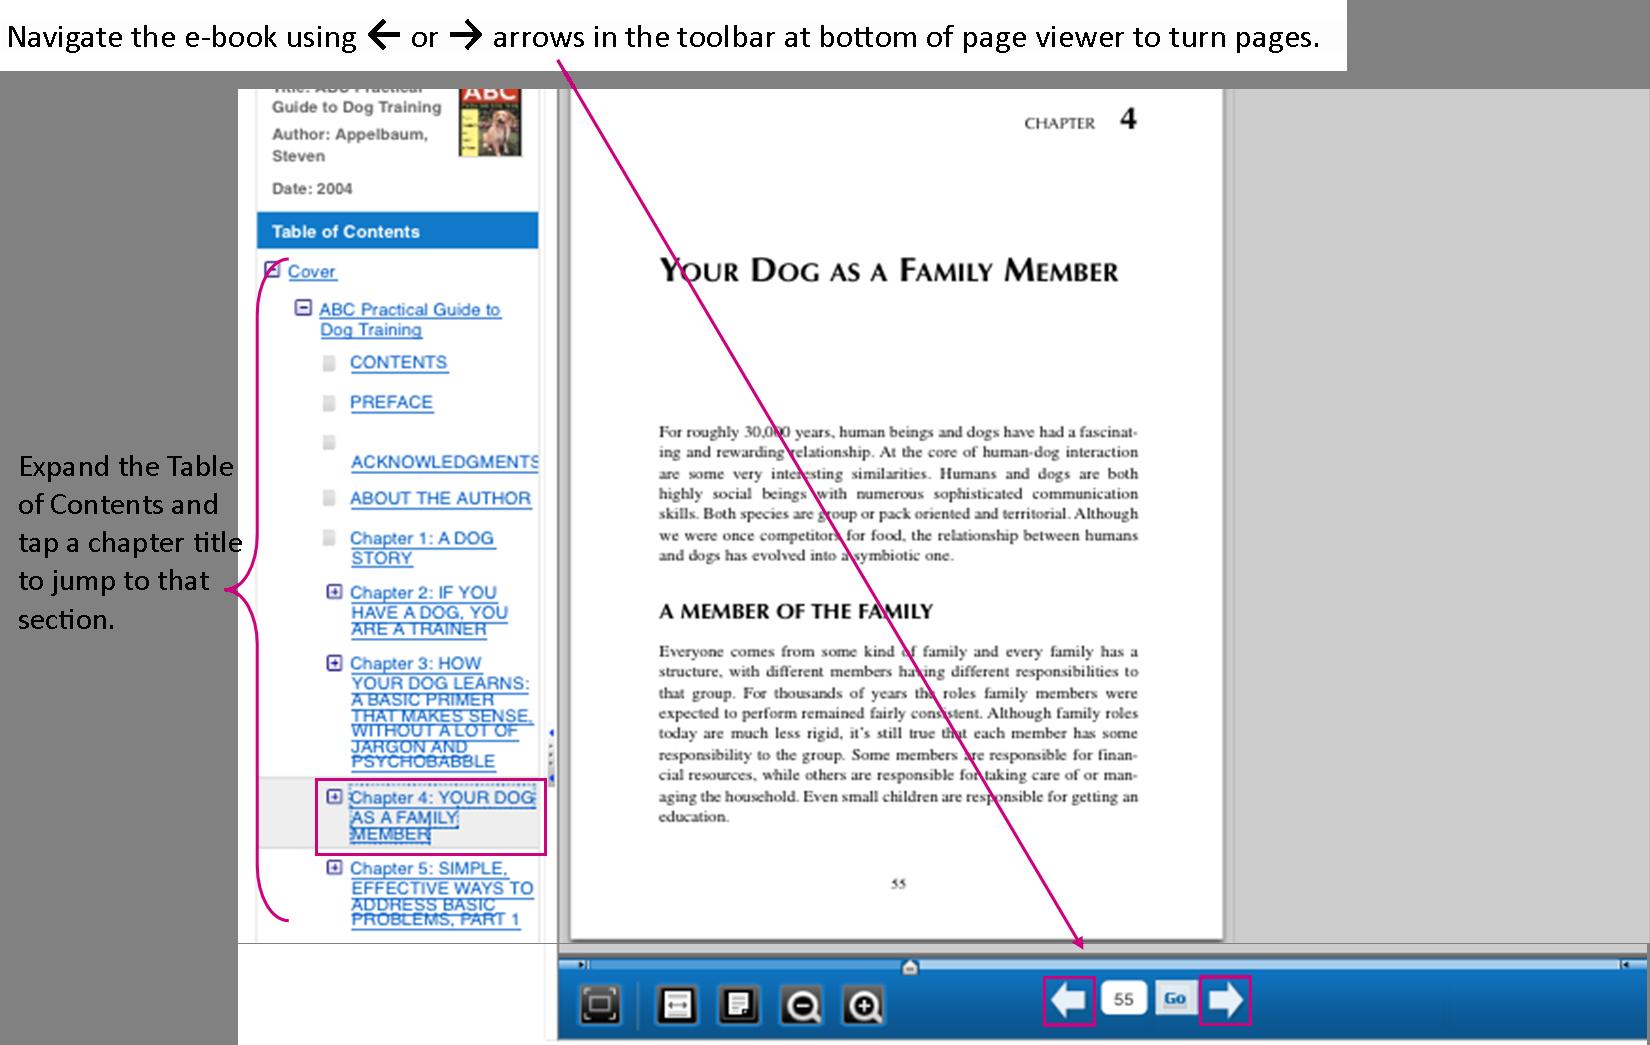 EBSCO eBook navigation